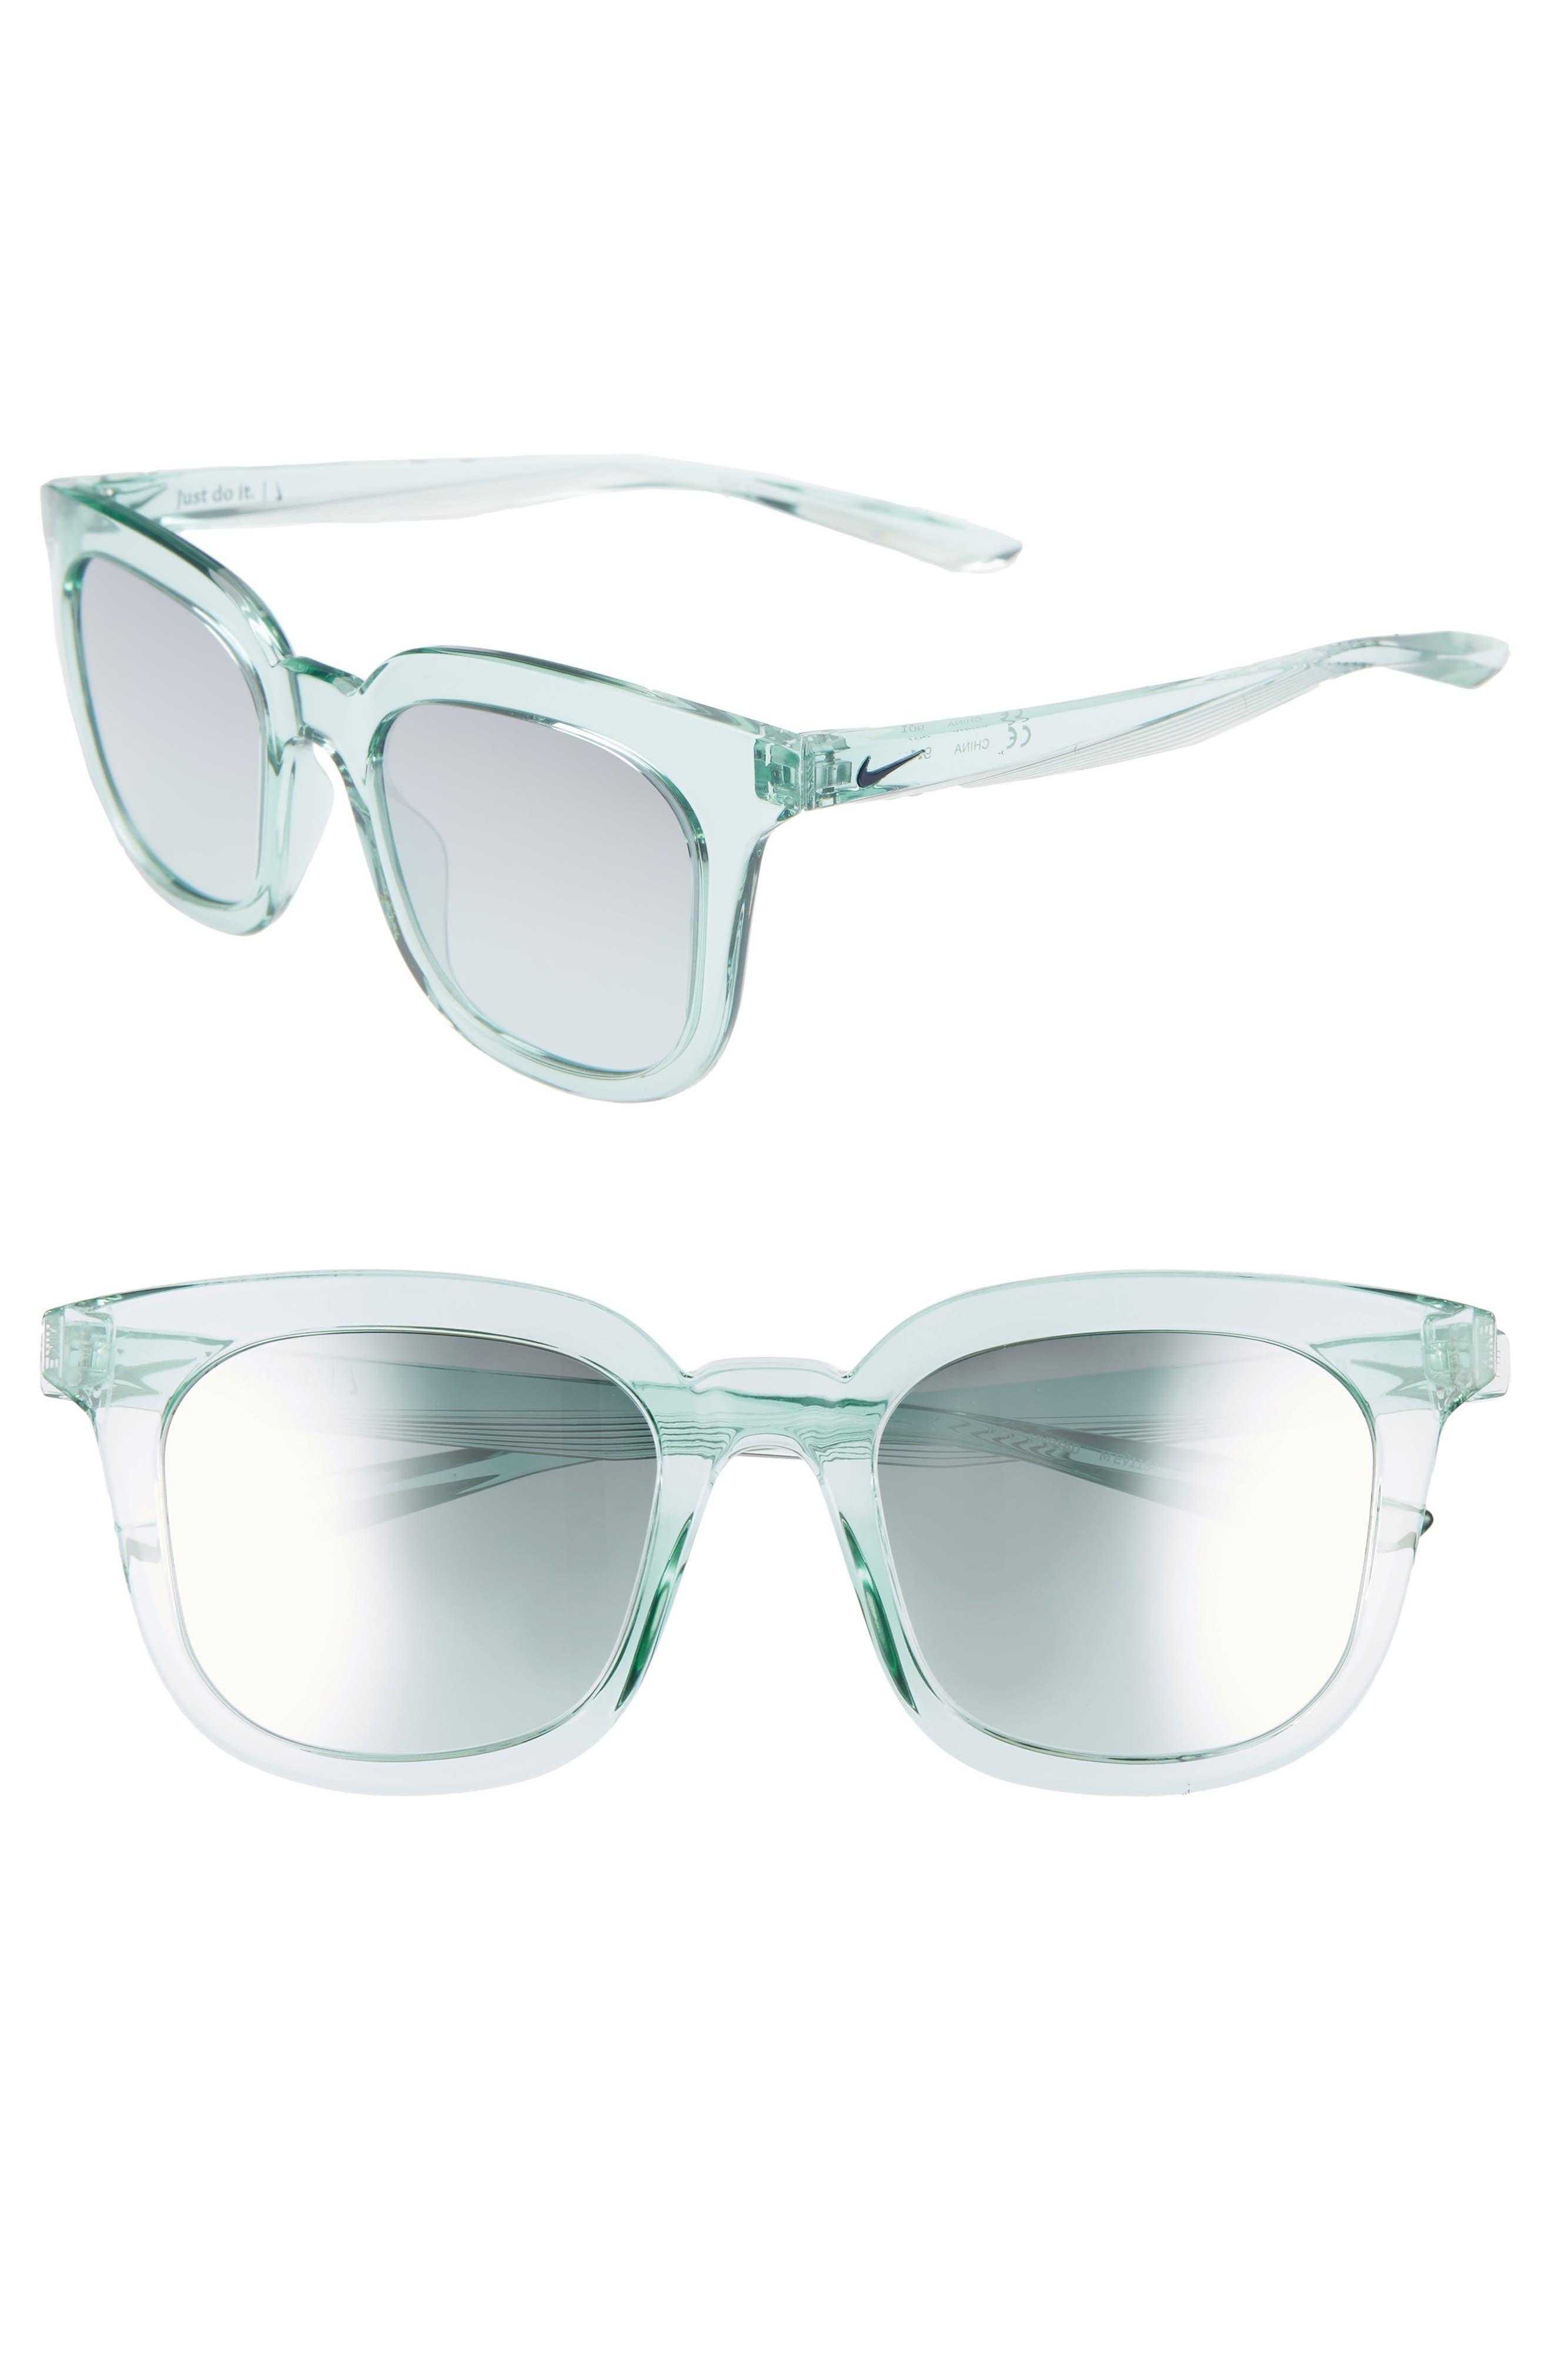 Nike Myriad 52Mm Mirrored Square Sunglasses - Igloo/ Gradient Teal